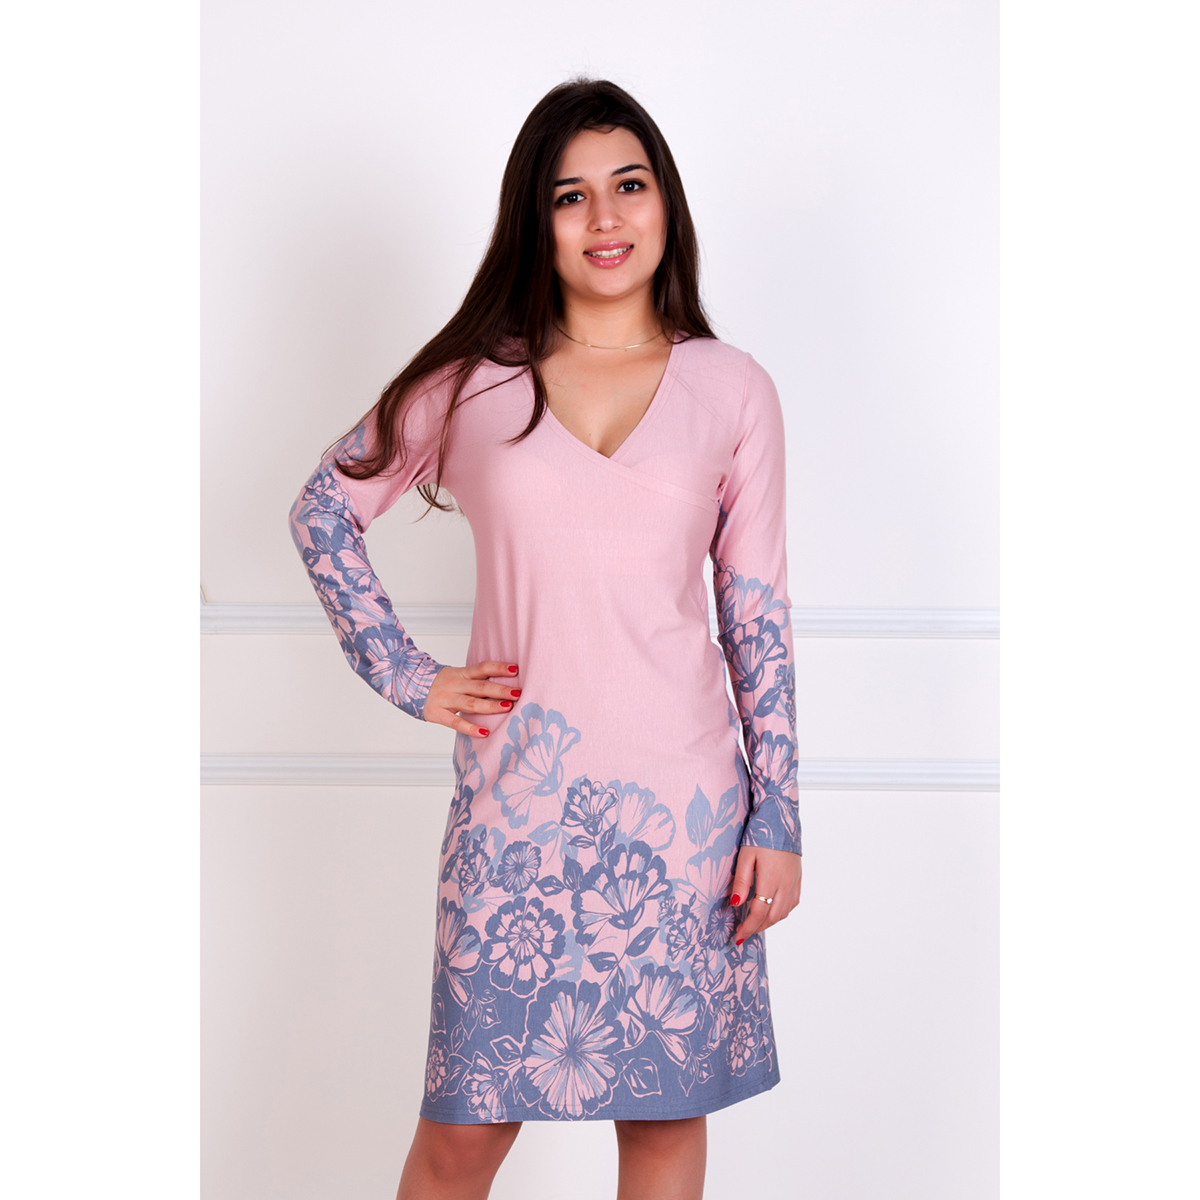 Женское платье Роберта, размер 42Платья<br>Обхват груди:84 см<br>Обхват талии:65 см<br>Обхват бедер:92 см<br>Рост:167 см<br><br>Тип: Жен. платье<br>Размер: 42<br>Материал: Вискоза